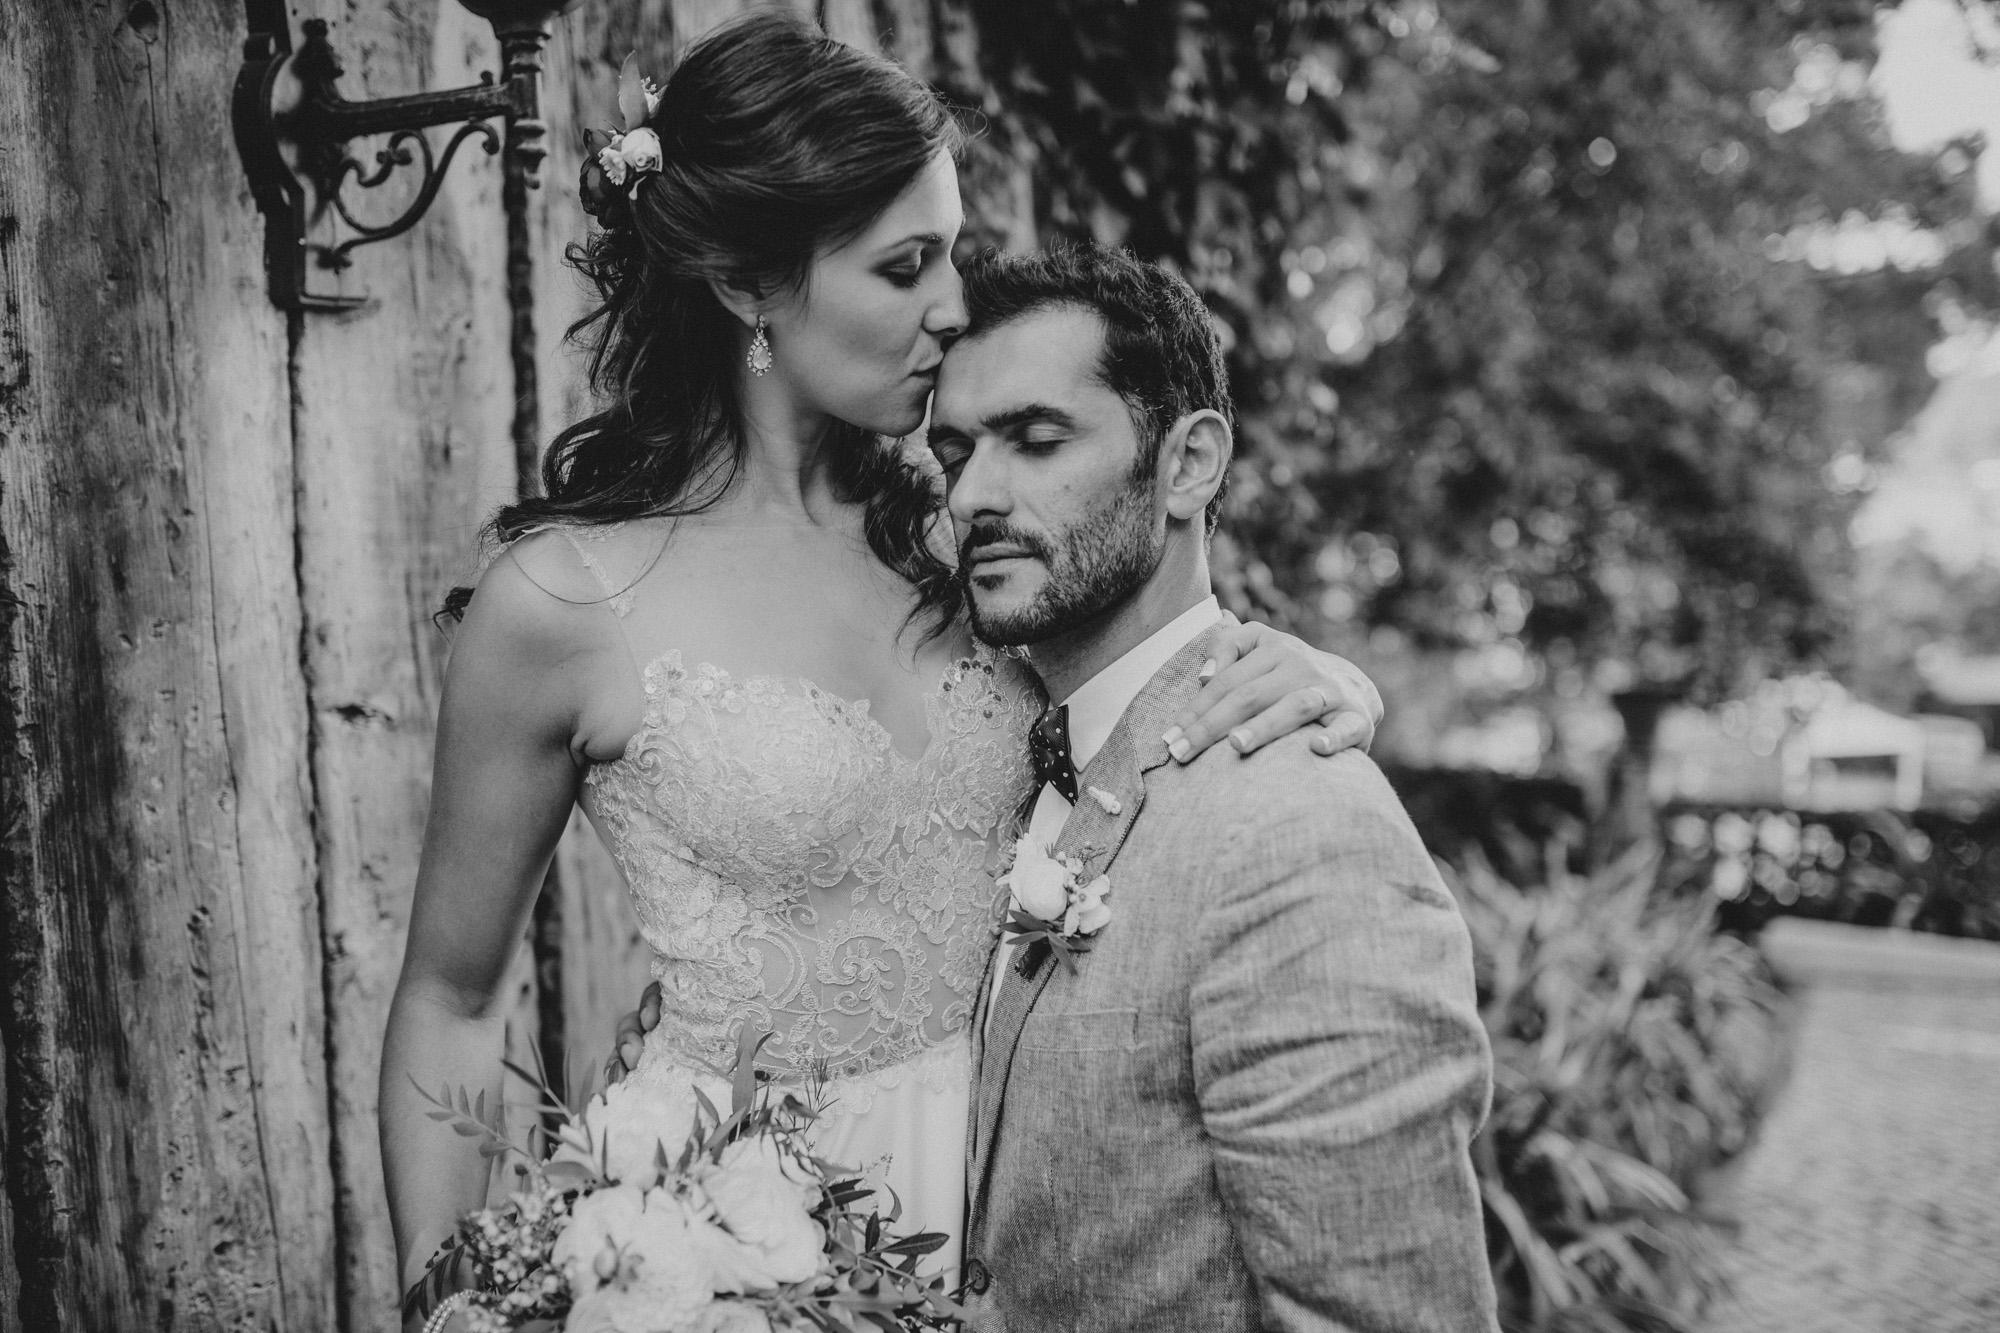 023-carina-e-samuel-wedding-casamento-quinta-dos-rouxinois-rustico-my-fancy-wedding-mafra-malveira-lisboa-sintra-cascais-filipe-santiago-fotografia-fotografo-lifestyle-destination-portugal